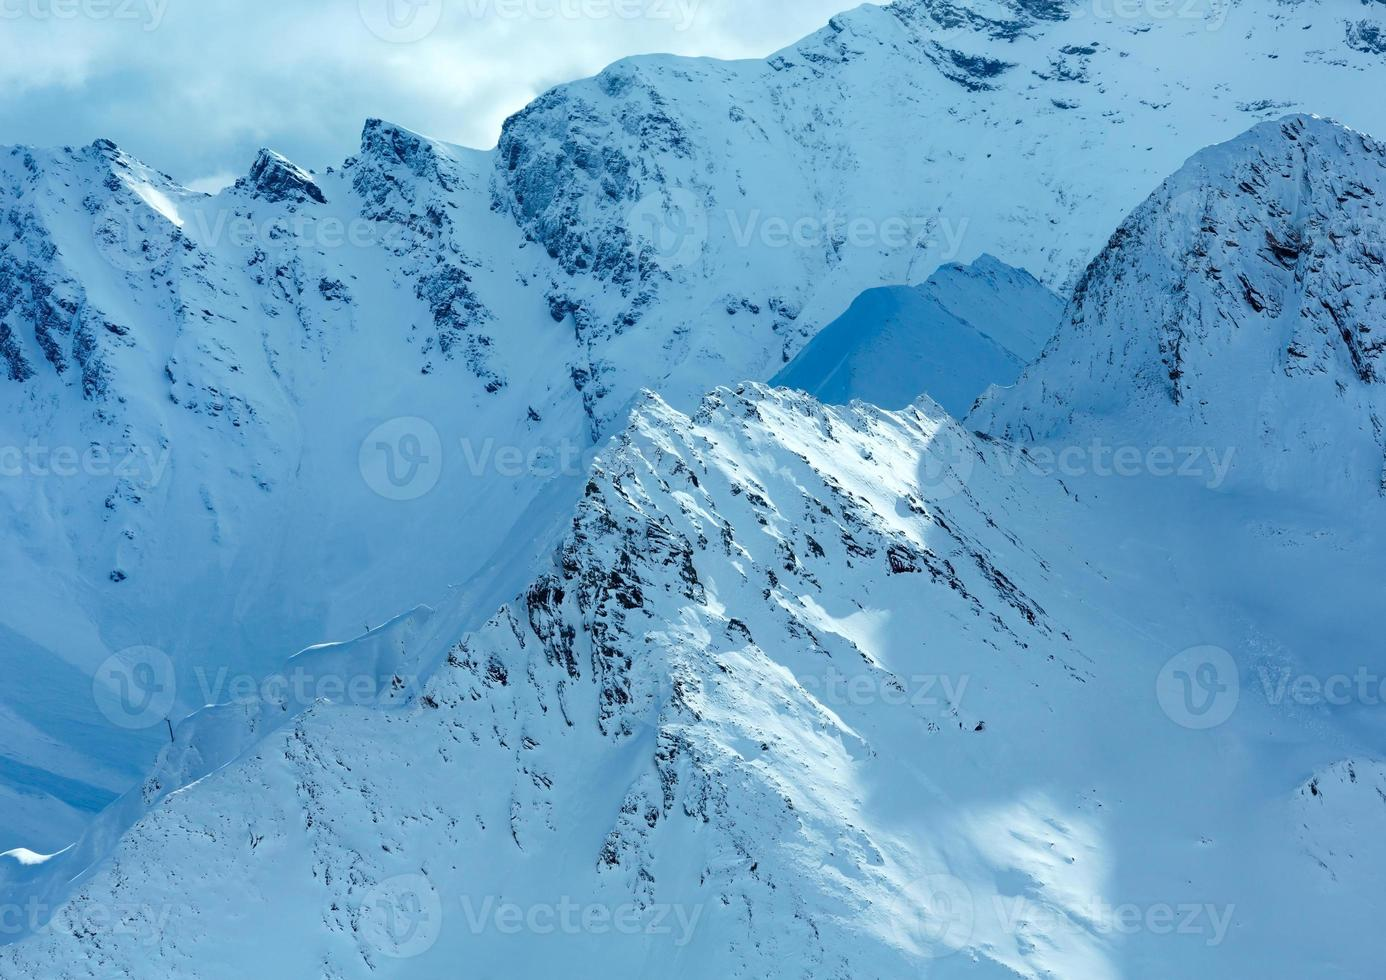 Silvretta Alpes vista de inverno (Áustria). foto